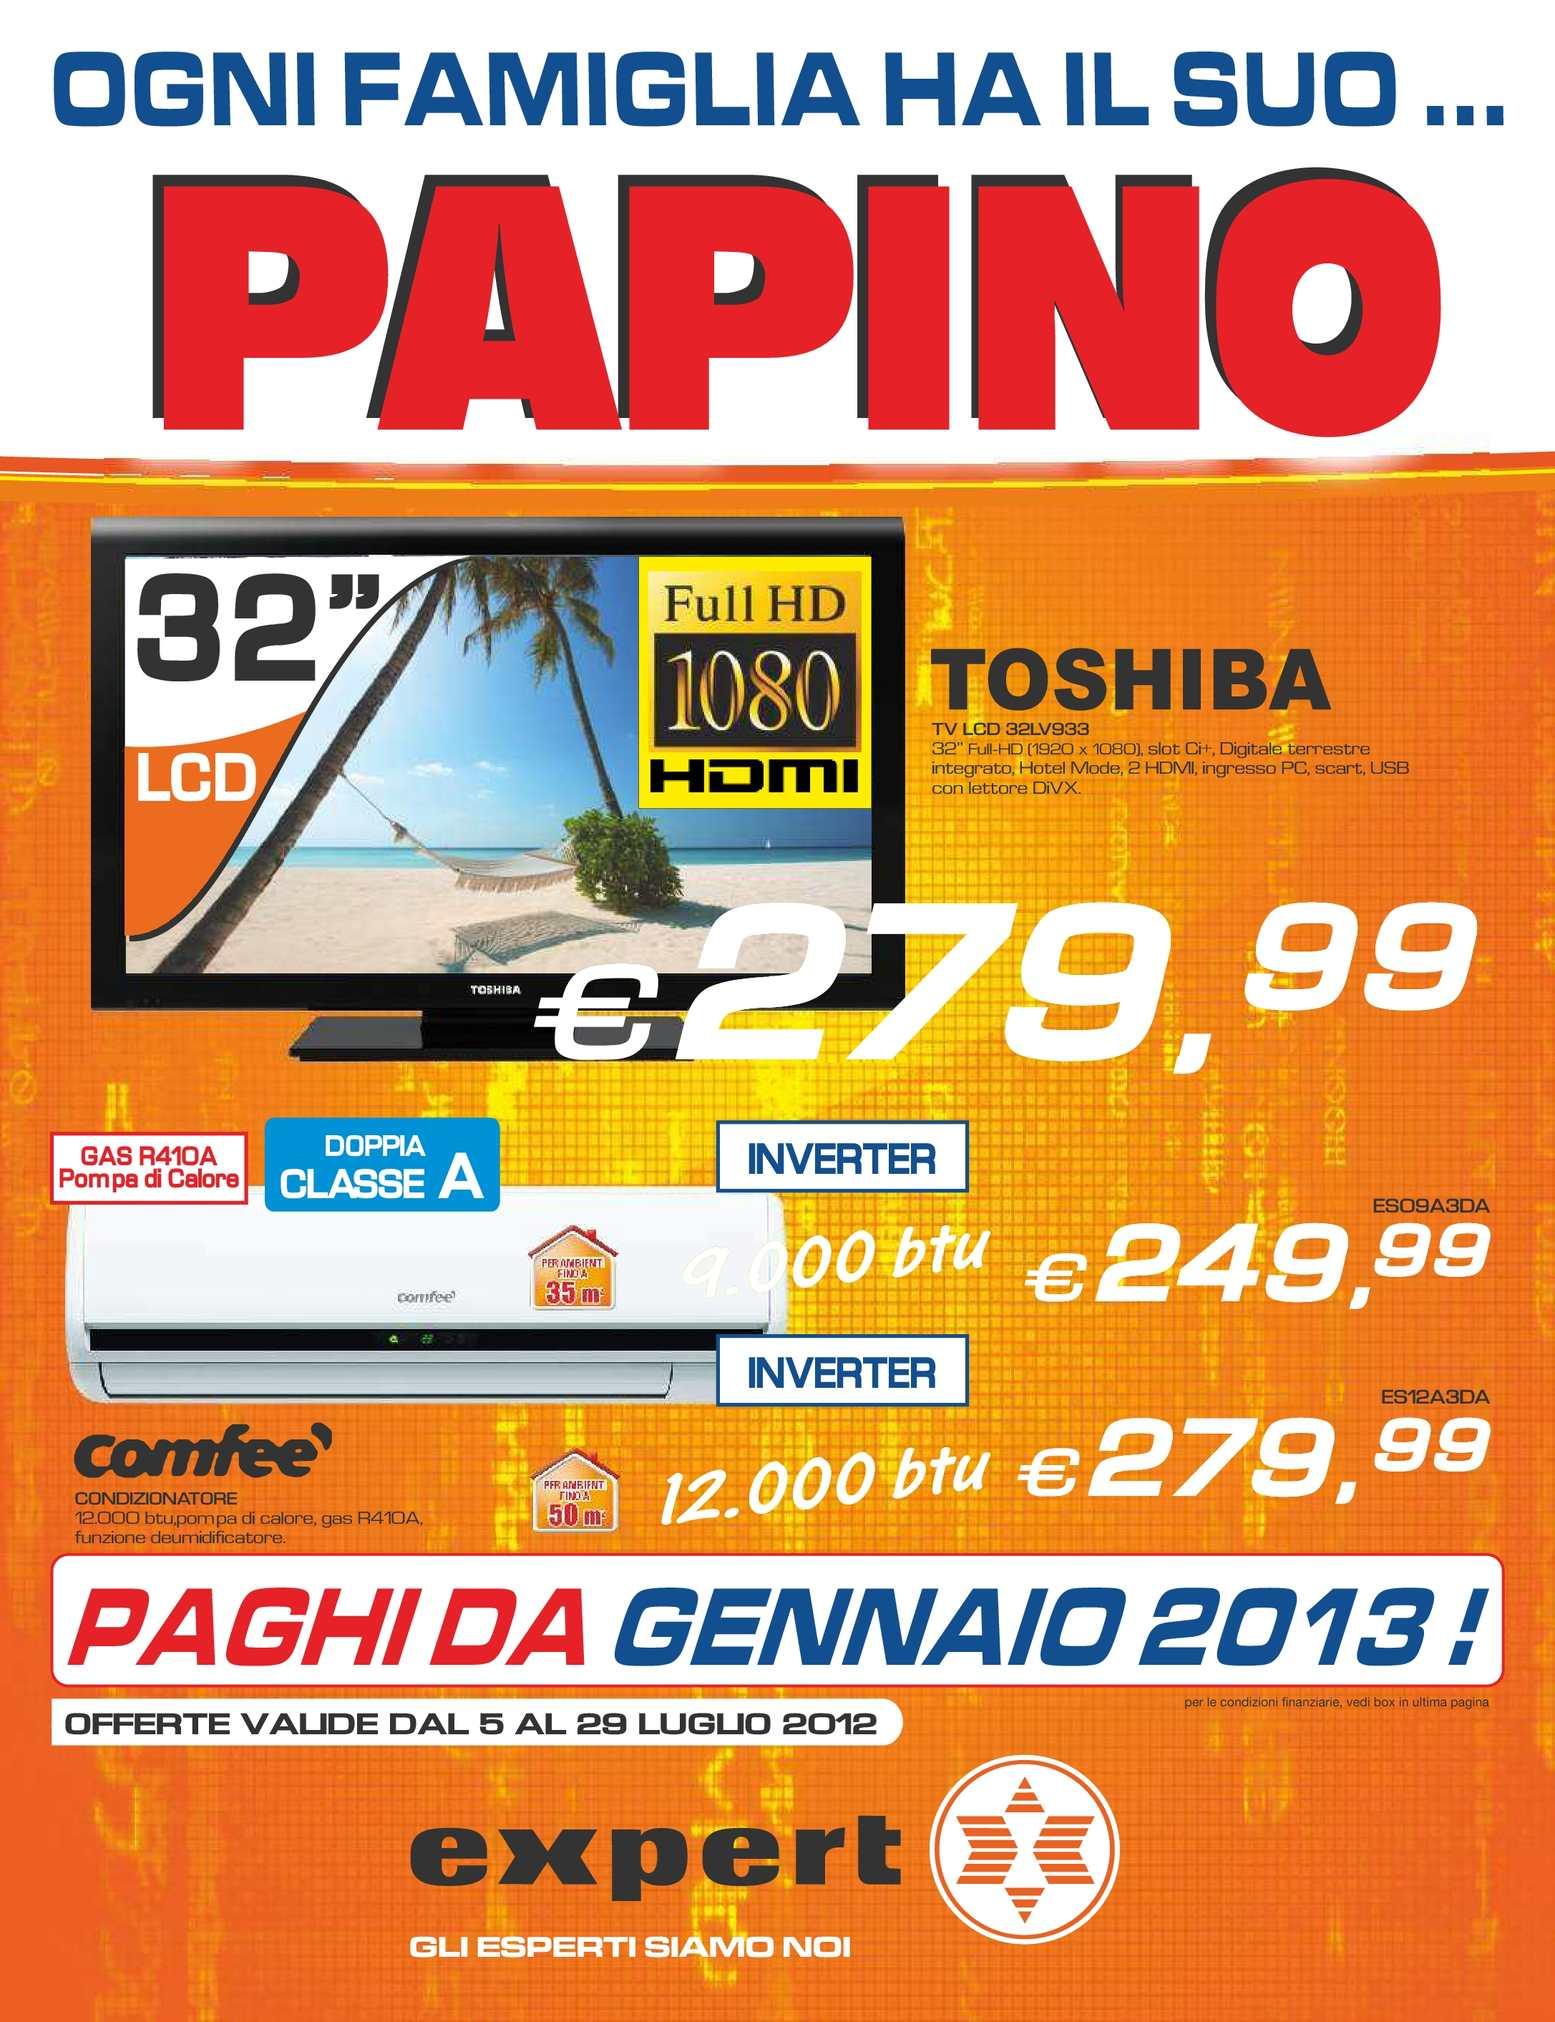 Calaméo - Volantino Expert gruppo Papino dal 5/7 al 29/07/2012